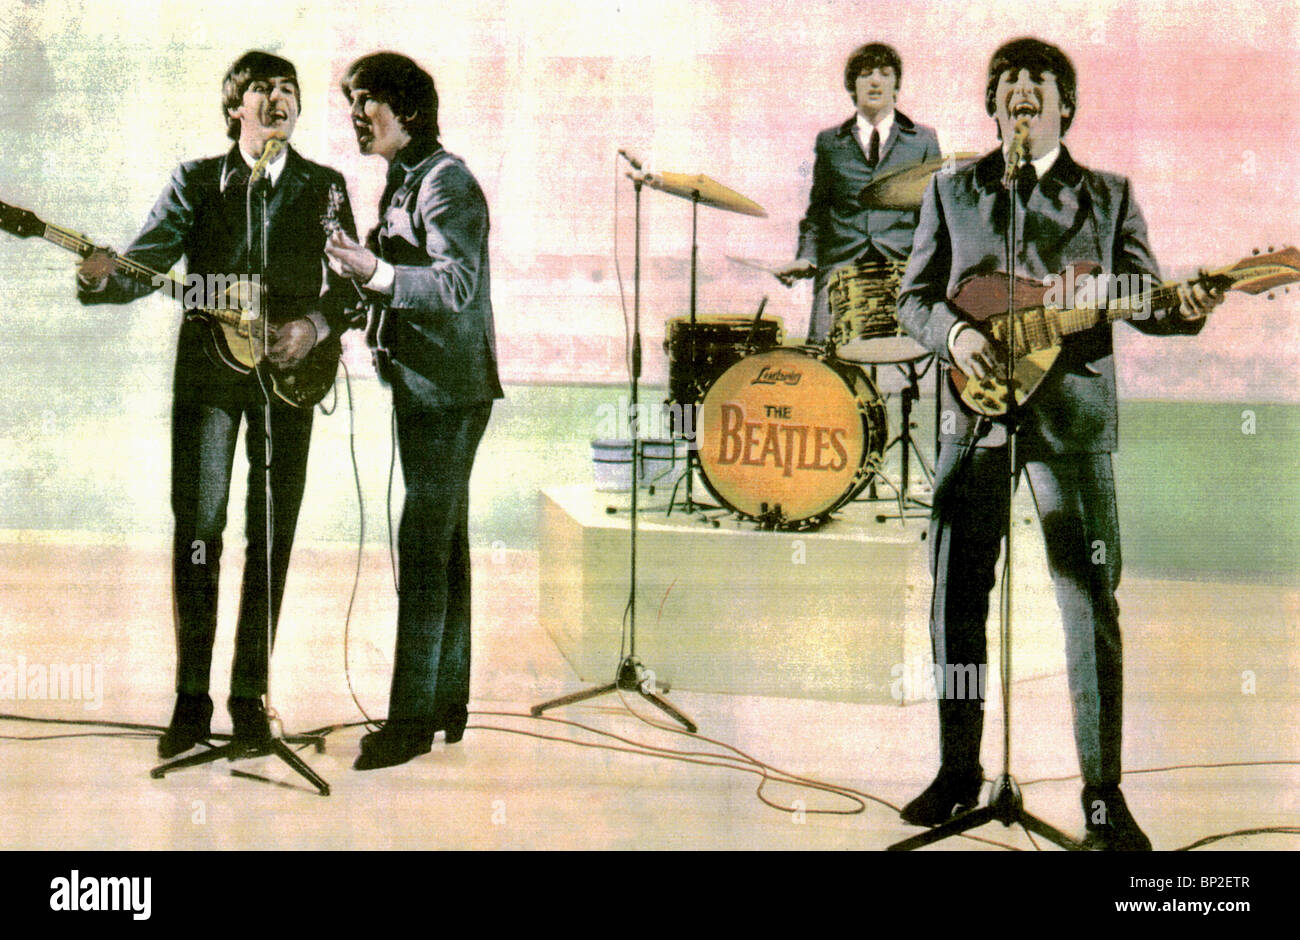 PAUL MCCARTNEY George Harrison Ringo Starr & JOHN LENNON de un duro día de la noche Beatles (1964). Imagen De Stock